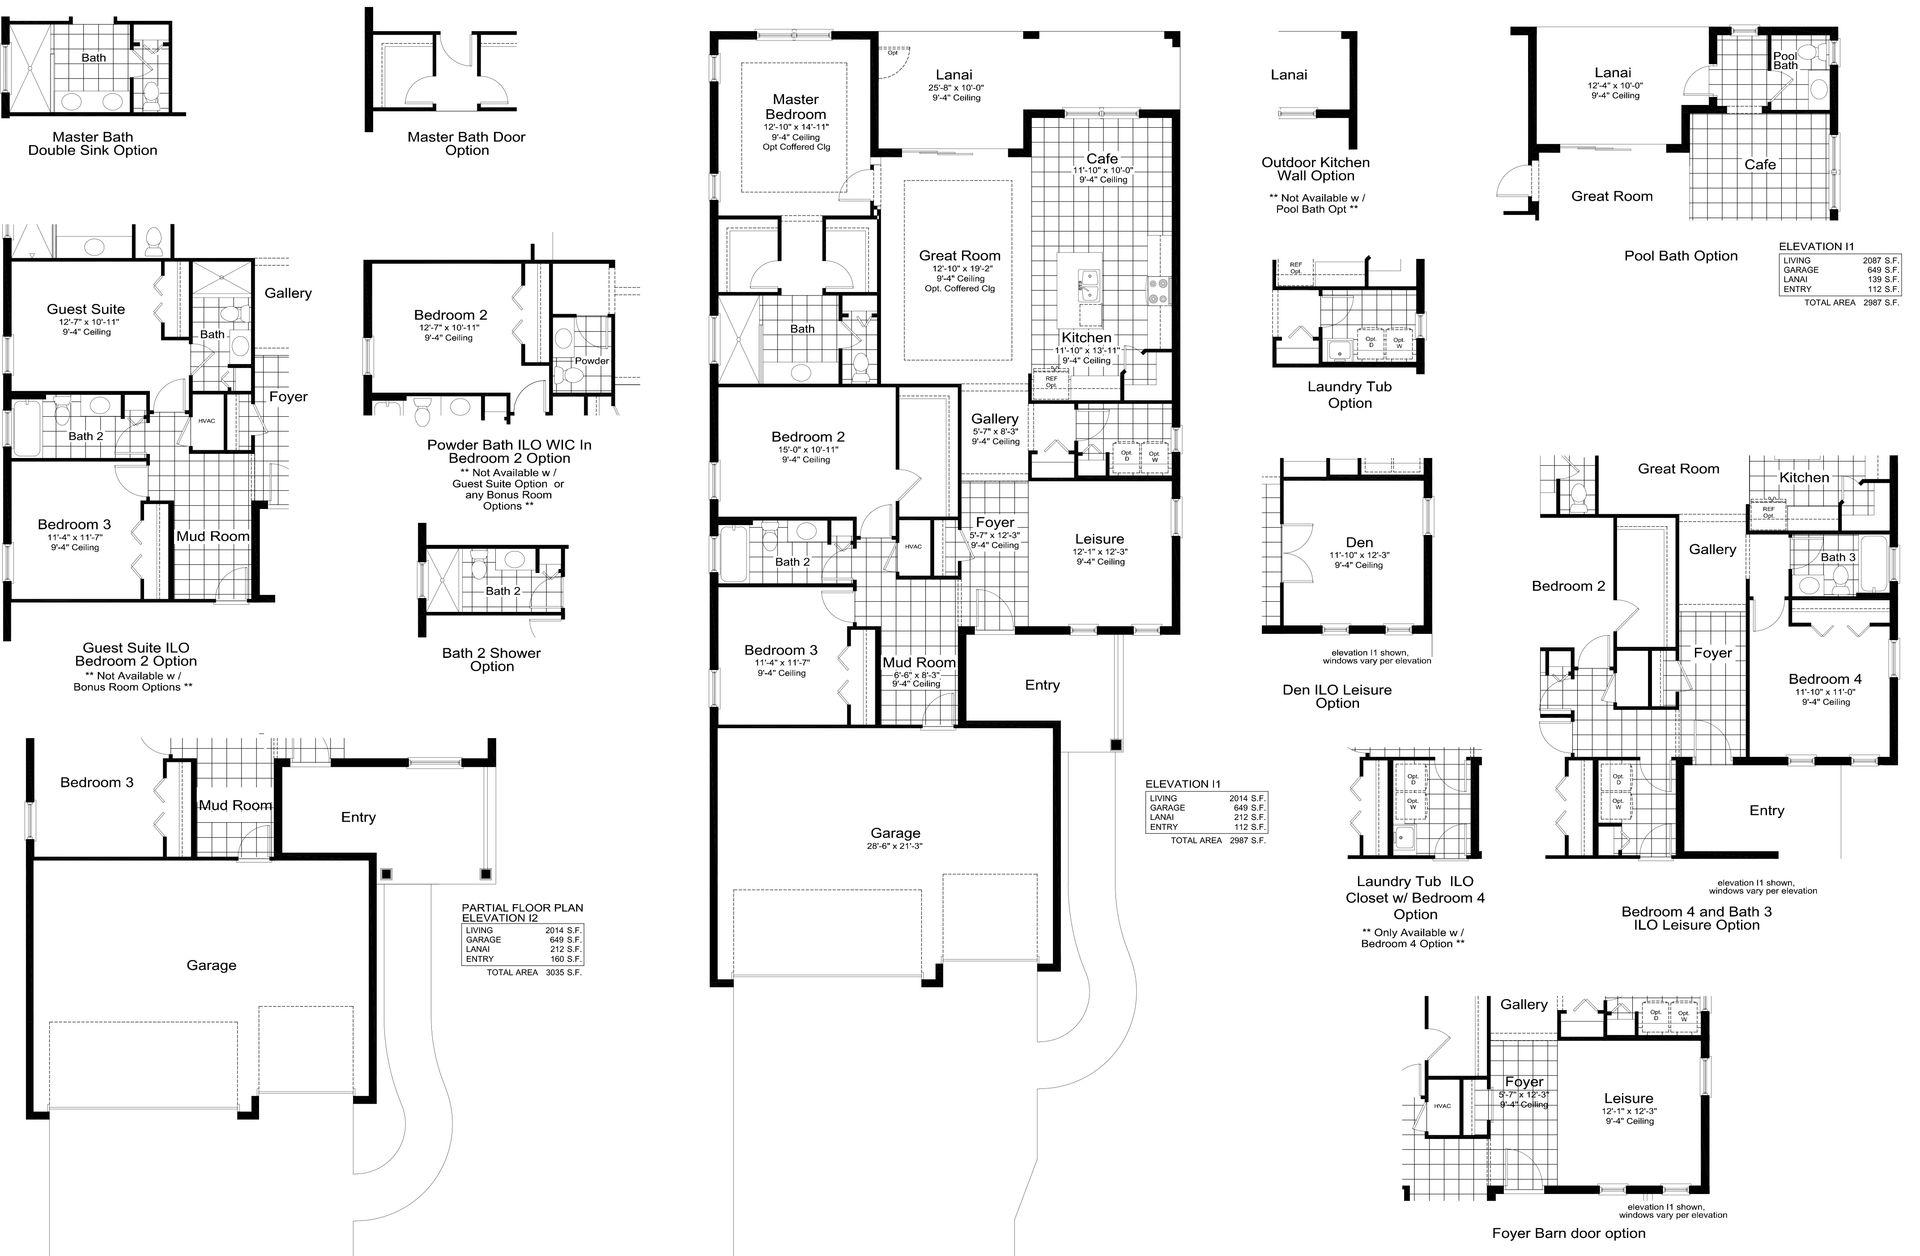 Meadow Brook Plan Parrish Florida 34219 At Circuit Diagram Of 8 To 3 Encoder Silverleaf By Neal Communities